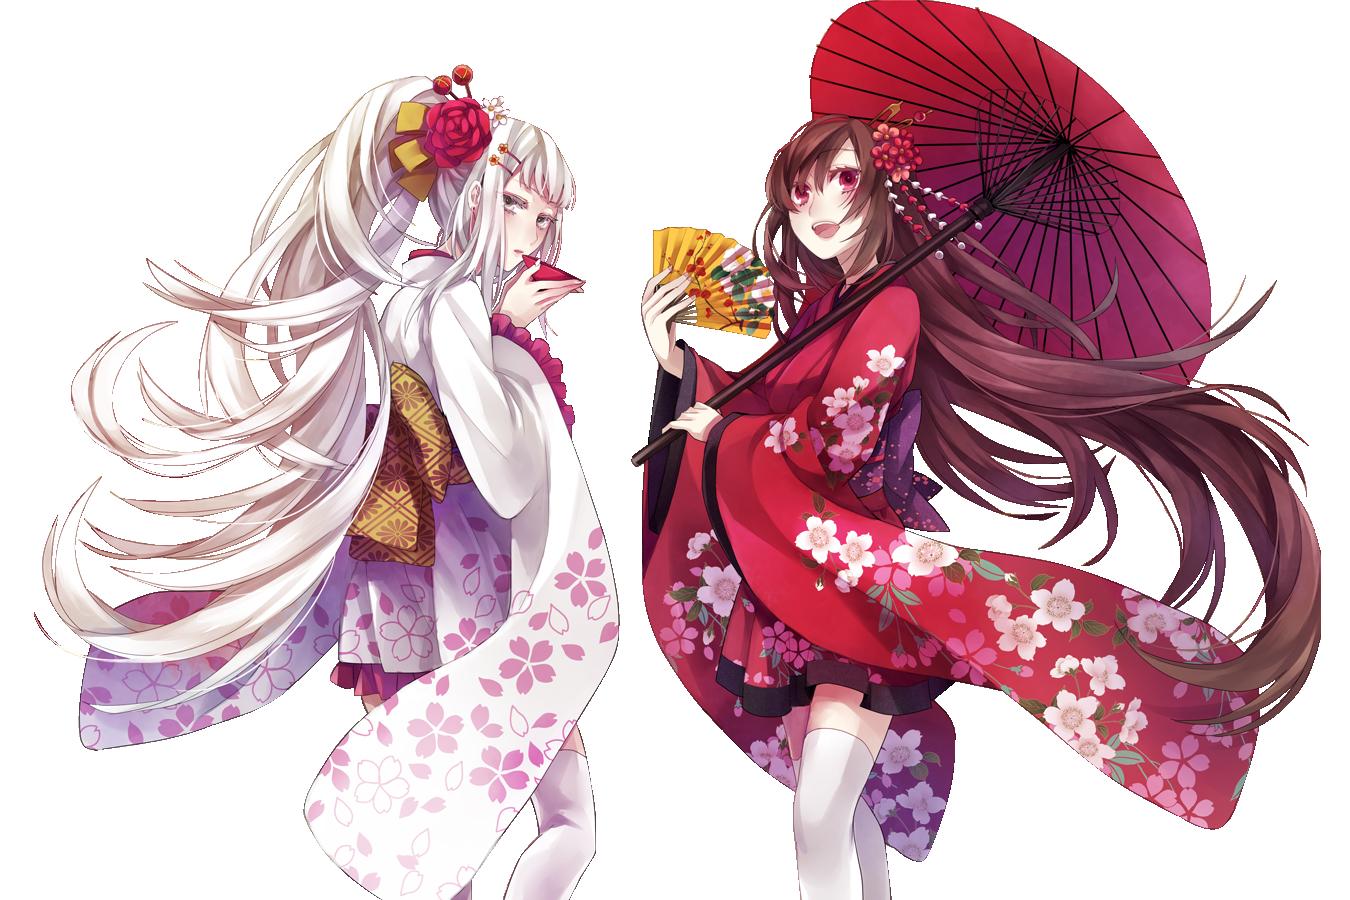 Render Fille Renders Fillesfemmes Ombrelle Eventail Kimono Tasse deCrBEQoWx